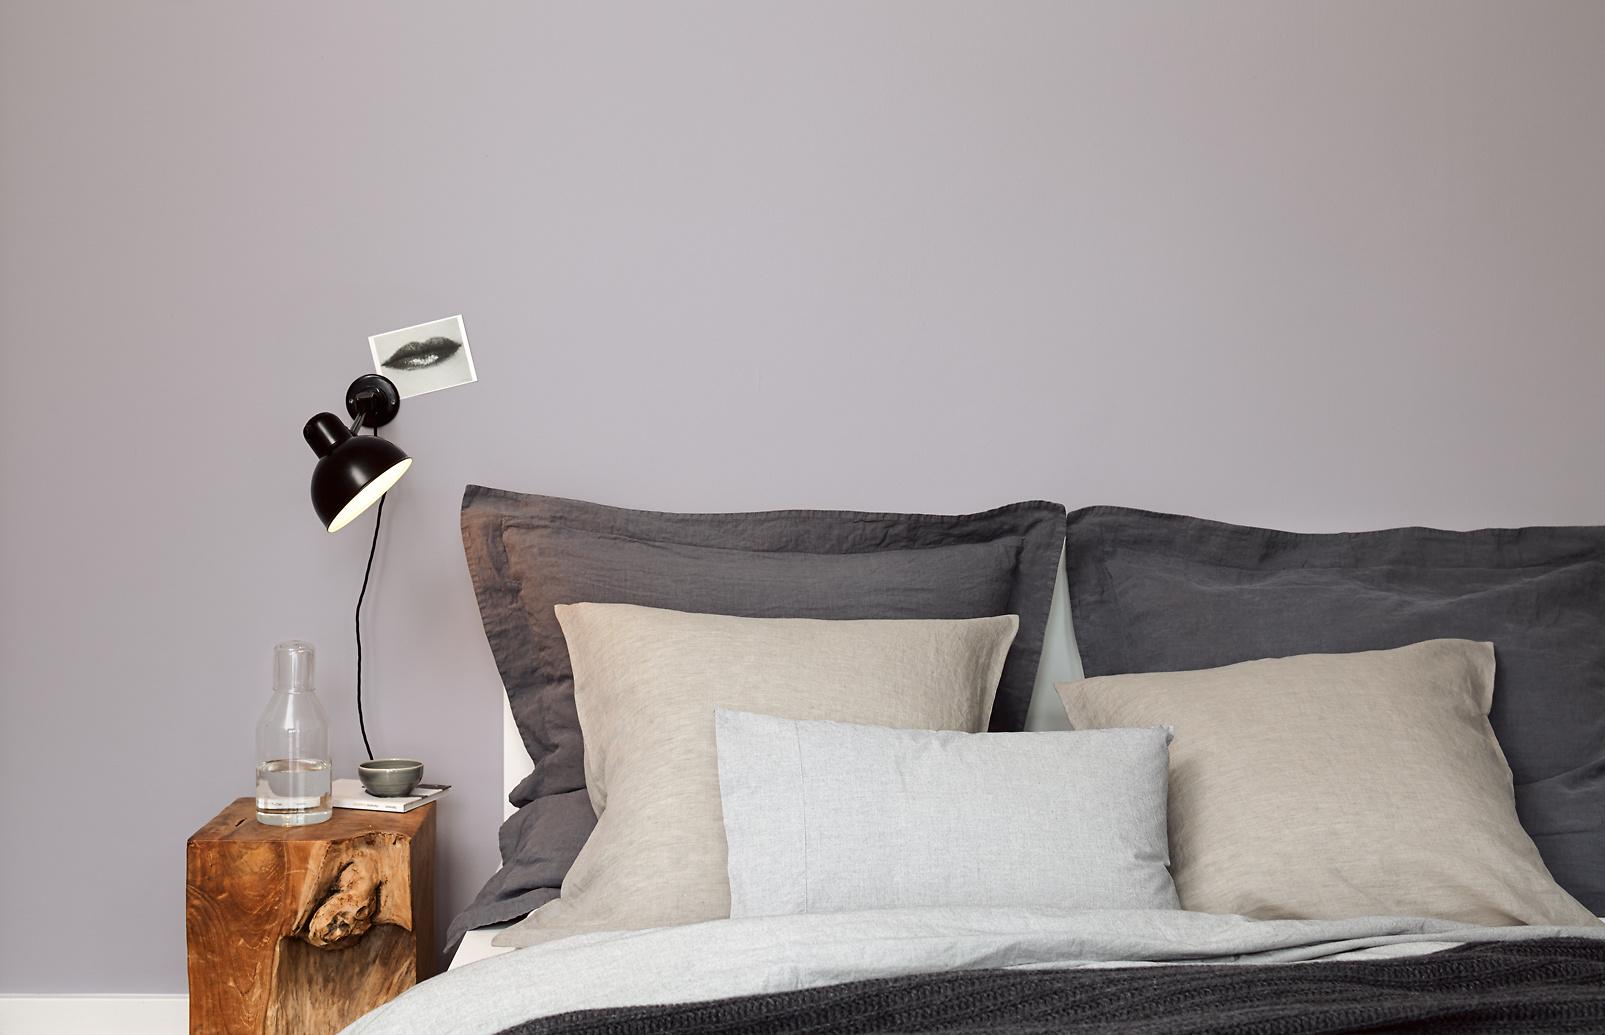 Schon Premium Wandfarbe. Violett, Grau Lila: Alpina Feine Farben LEISER MOMENT    Alpina Farben